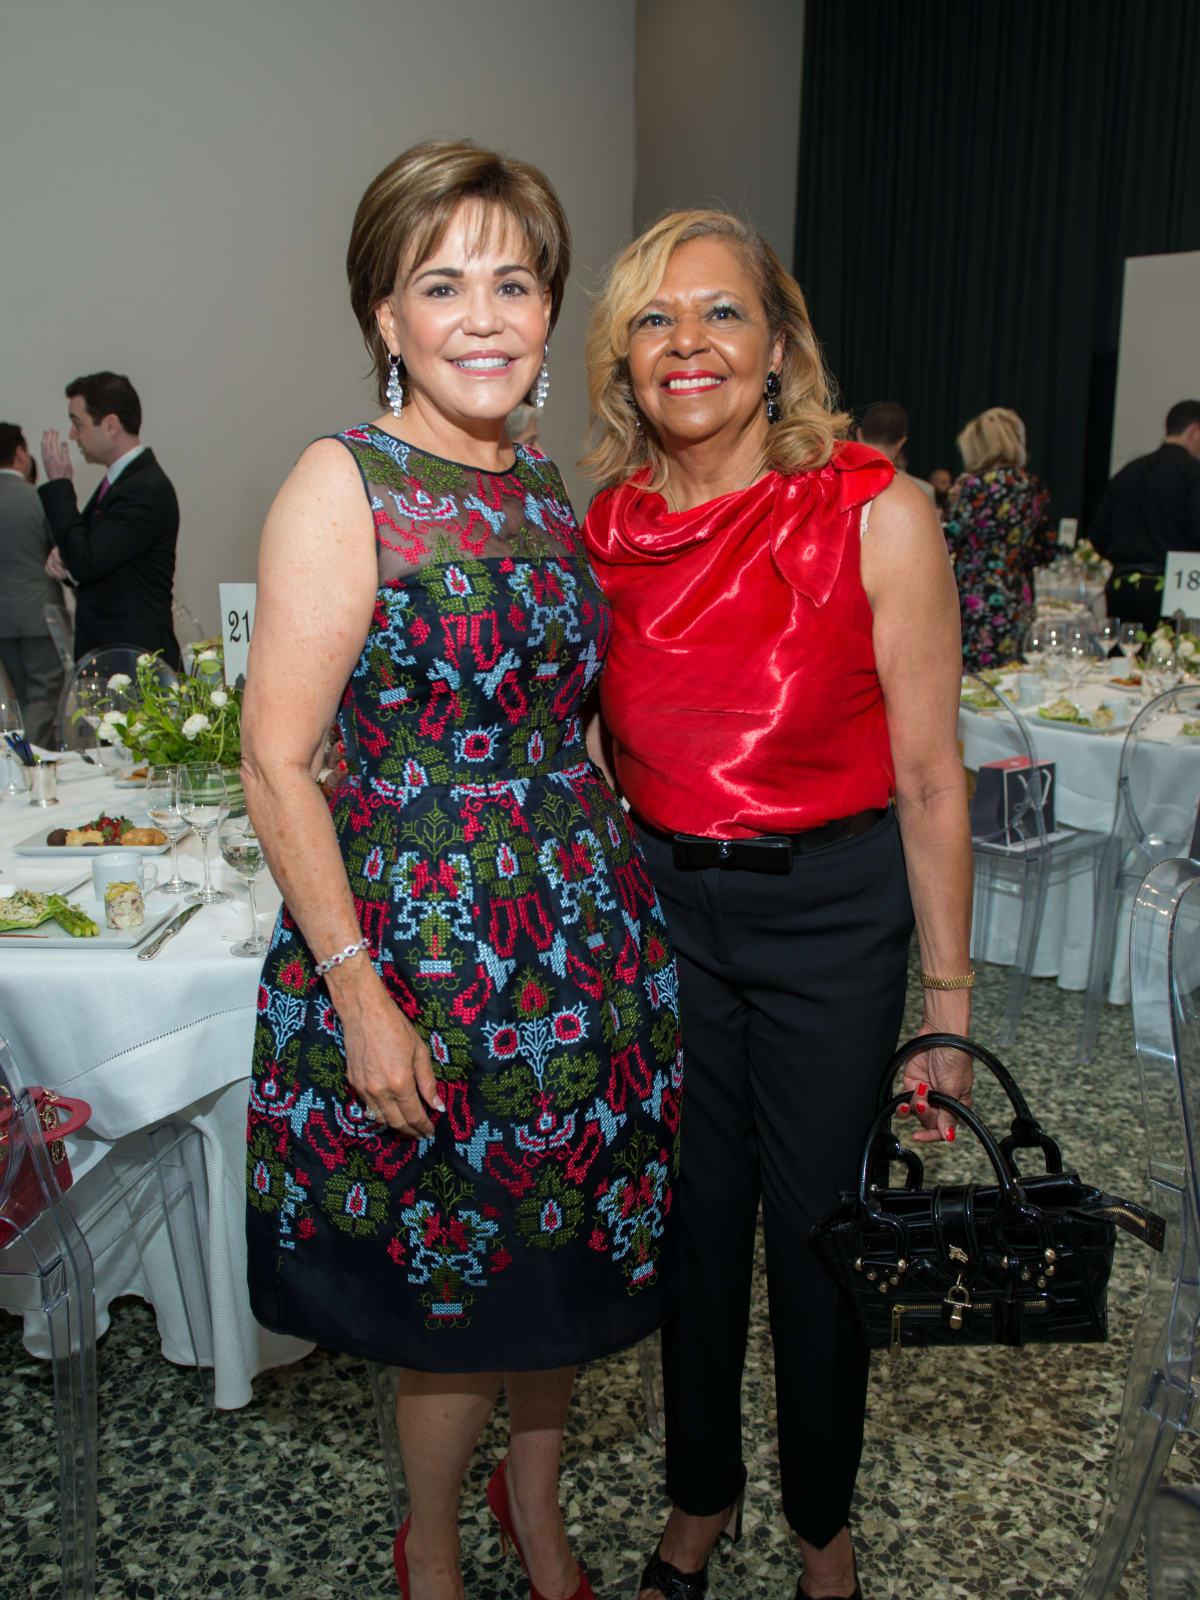 Hallie Vanderhider, Yvonne Cormier at Oscar de la Renta fashion show at MFAH